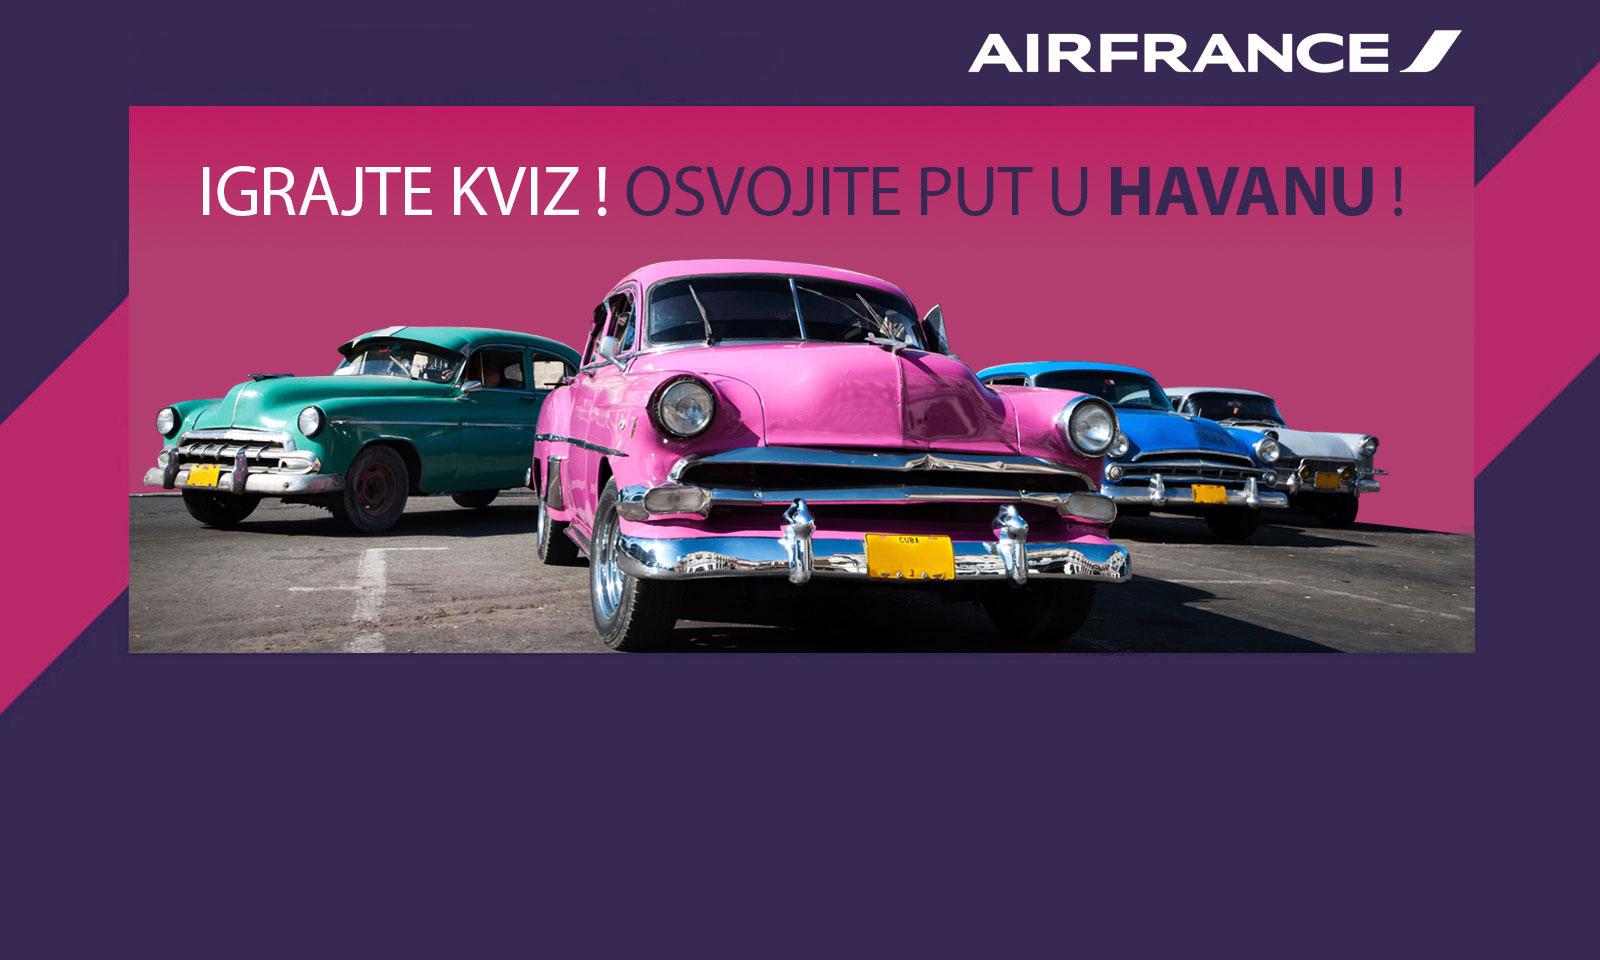 airfrance-havana-slide